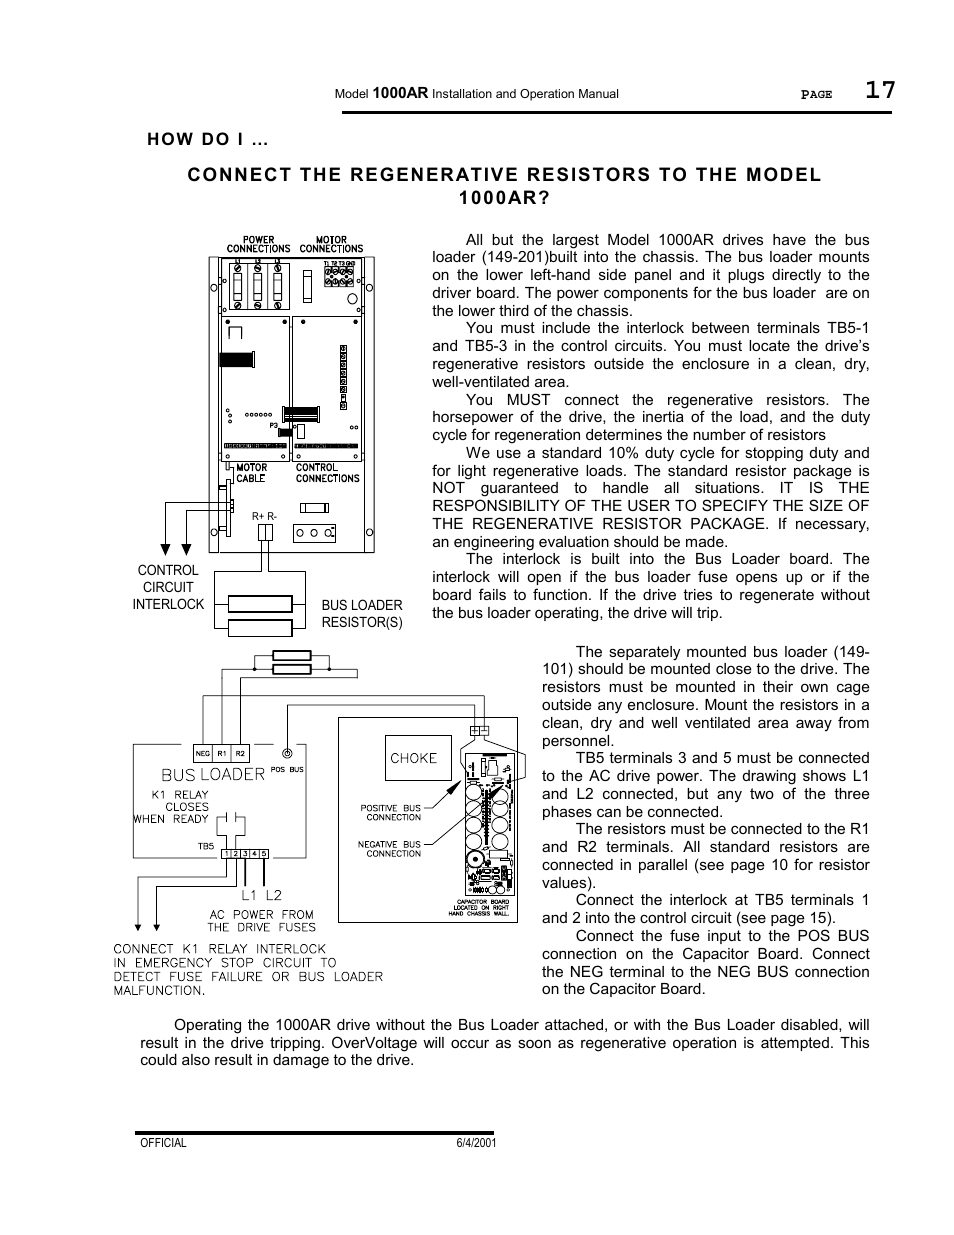 Bldc Motor Controller Manual Enthusiast Wiring Diagrams Dc Control Using Relay How Do I Powertec Regenerative Brushless 1000ar Rh Manualsdir Com